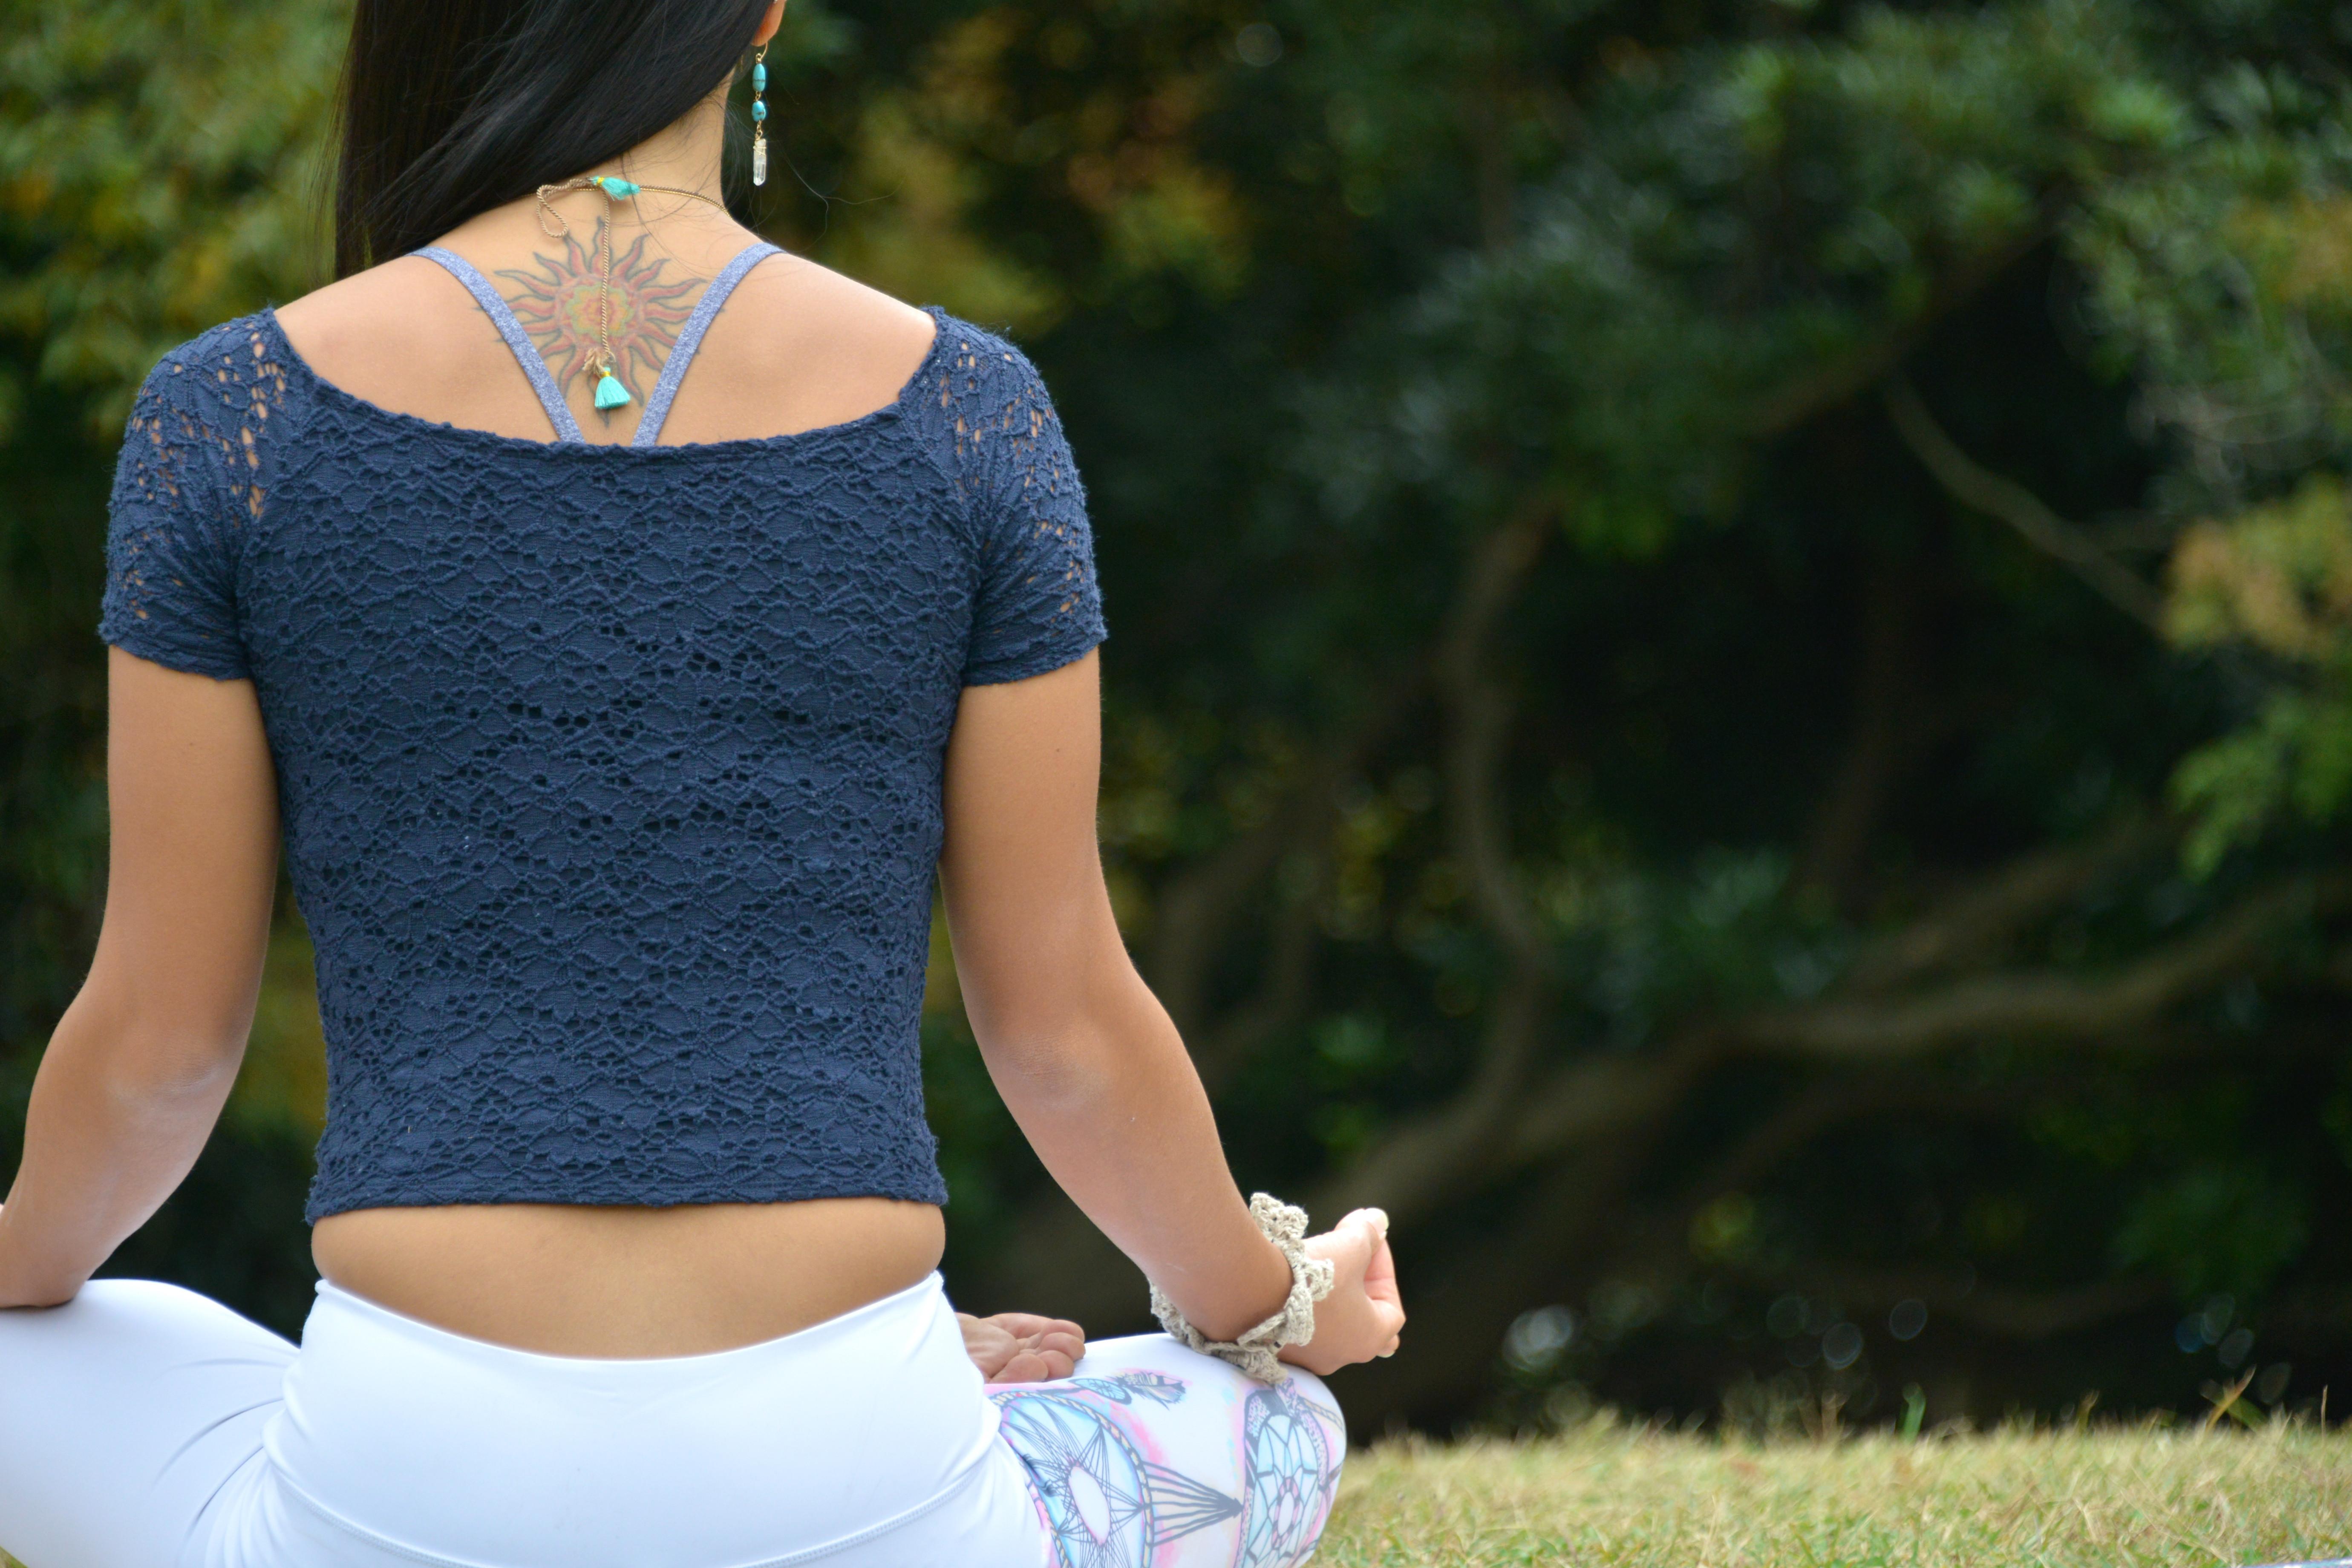 personal yoga  2人より